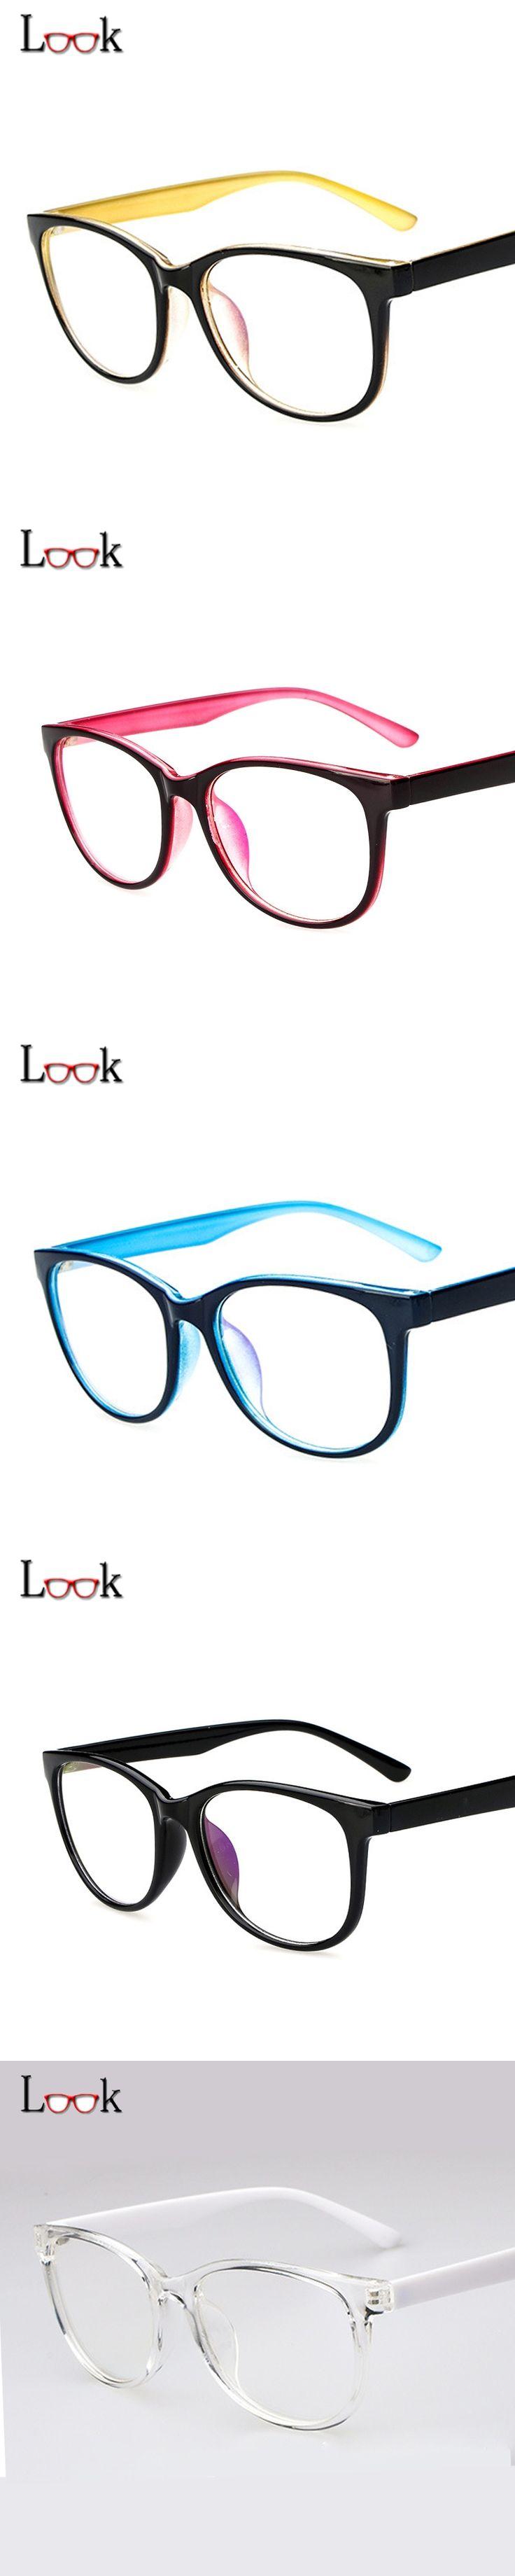 2017 Fashion Ultra Light Can Be Bent Optical Glasses Frame Women Men Clear Computer Glasses Prescription Eyewear Lunette De Vue